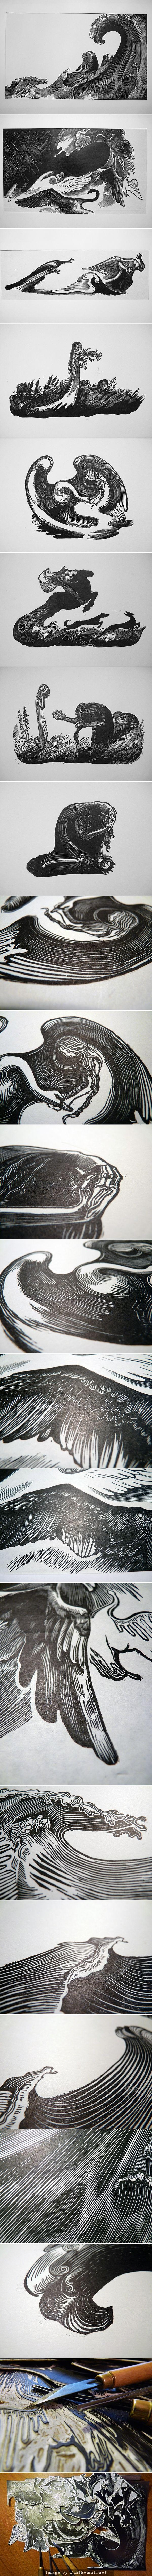 Linocut illustration by Dmitry Okulich-Kazarin https://www.behance.net/dmitok